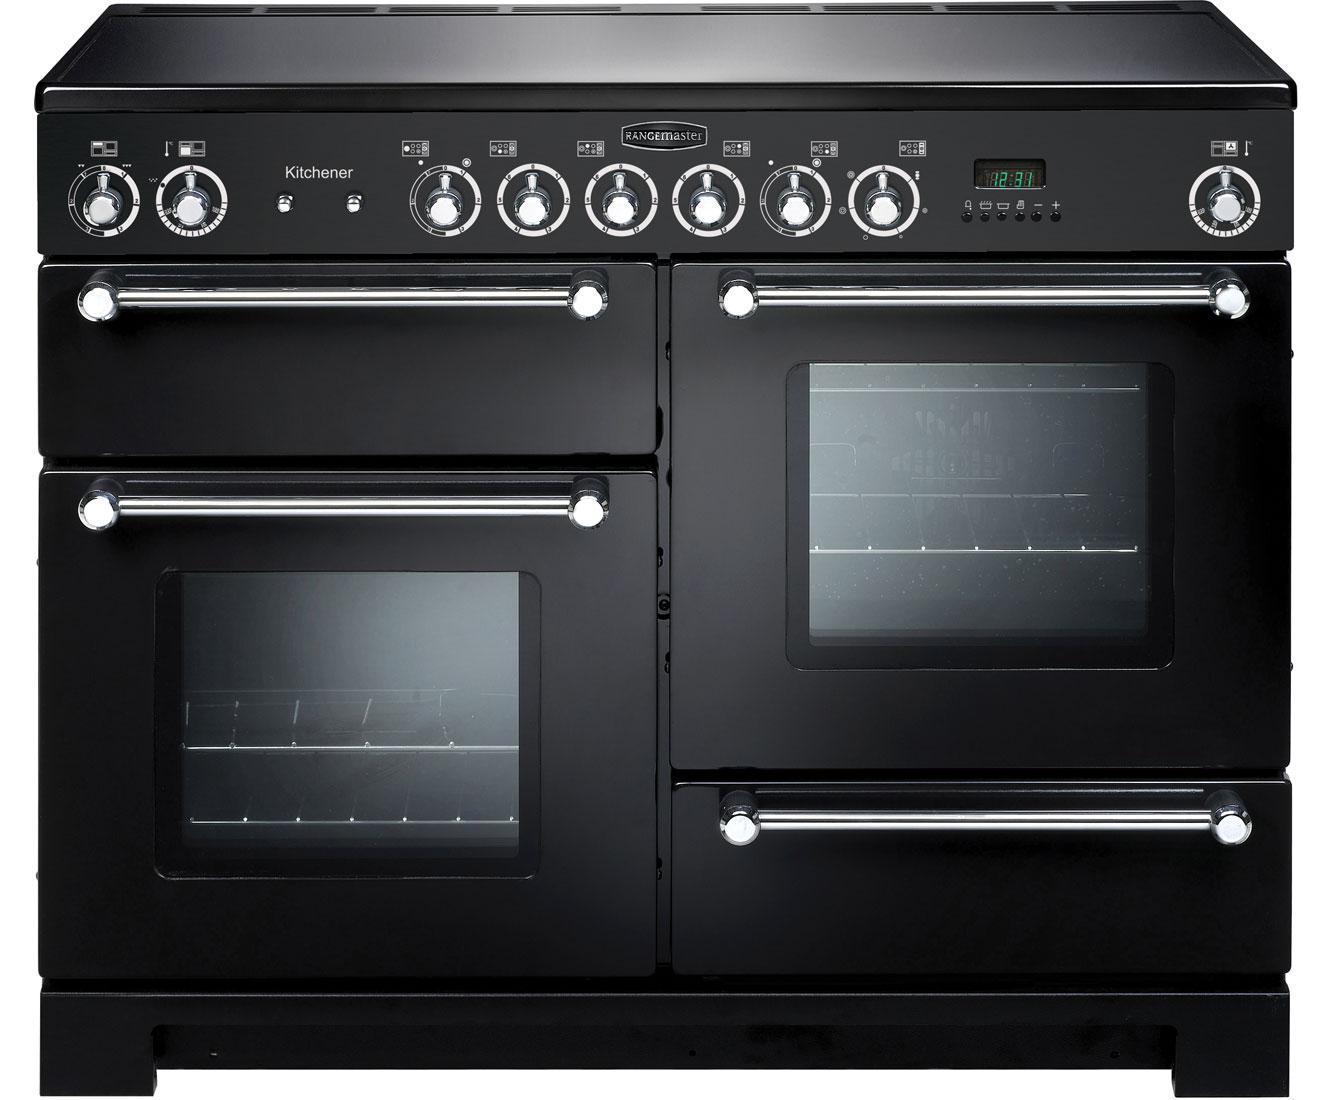 Rangemaster Kitchener KCH110ECBLC Free Standing Range Cooker in Black  Chrome